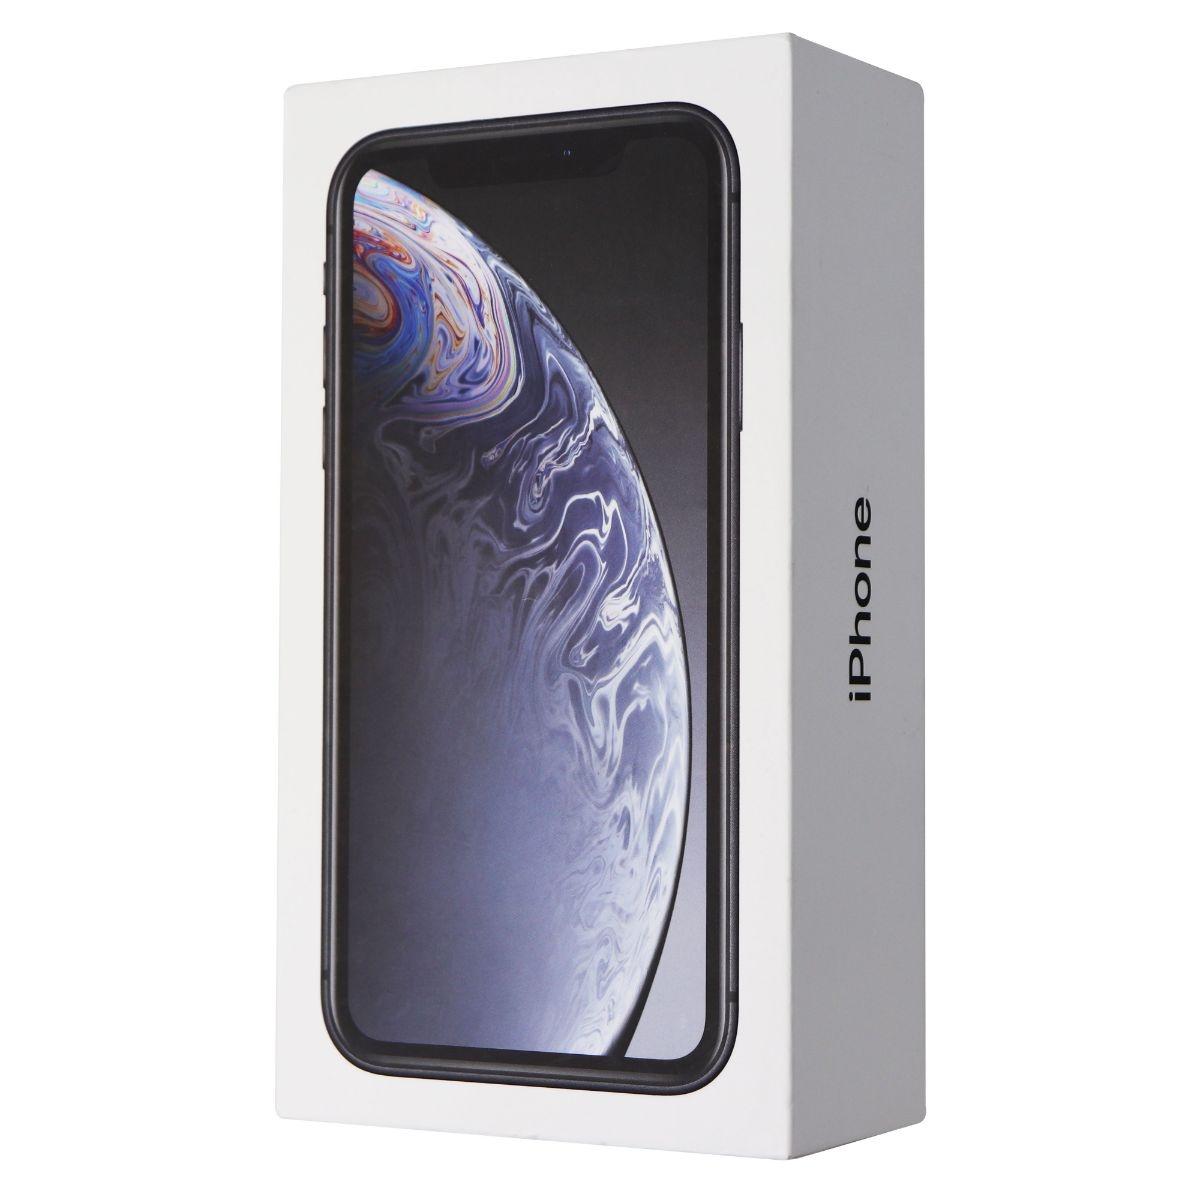 RETAIL BOX - Apple iPhone XR - 256GB / Black - NO DEVICE